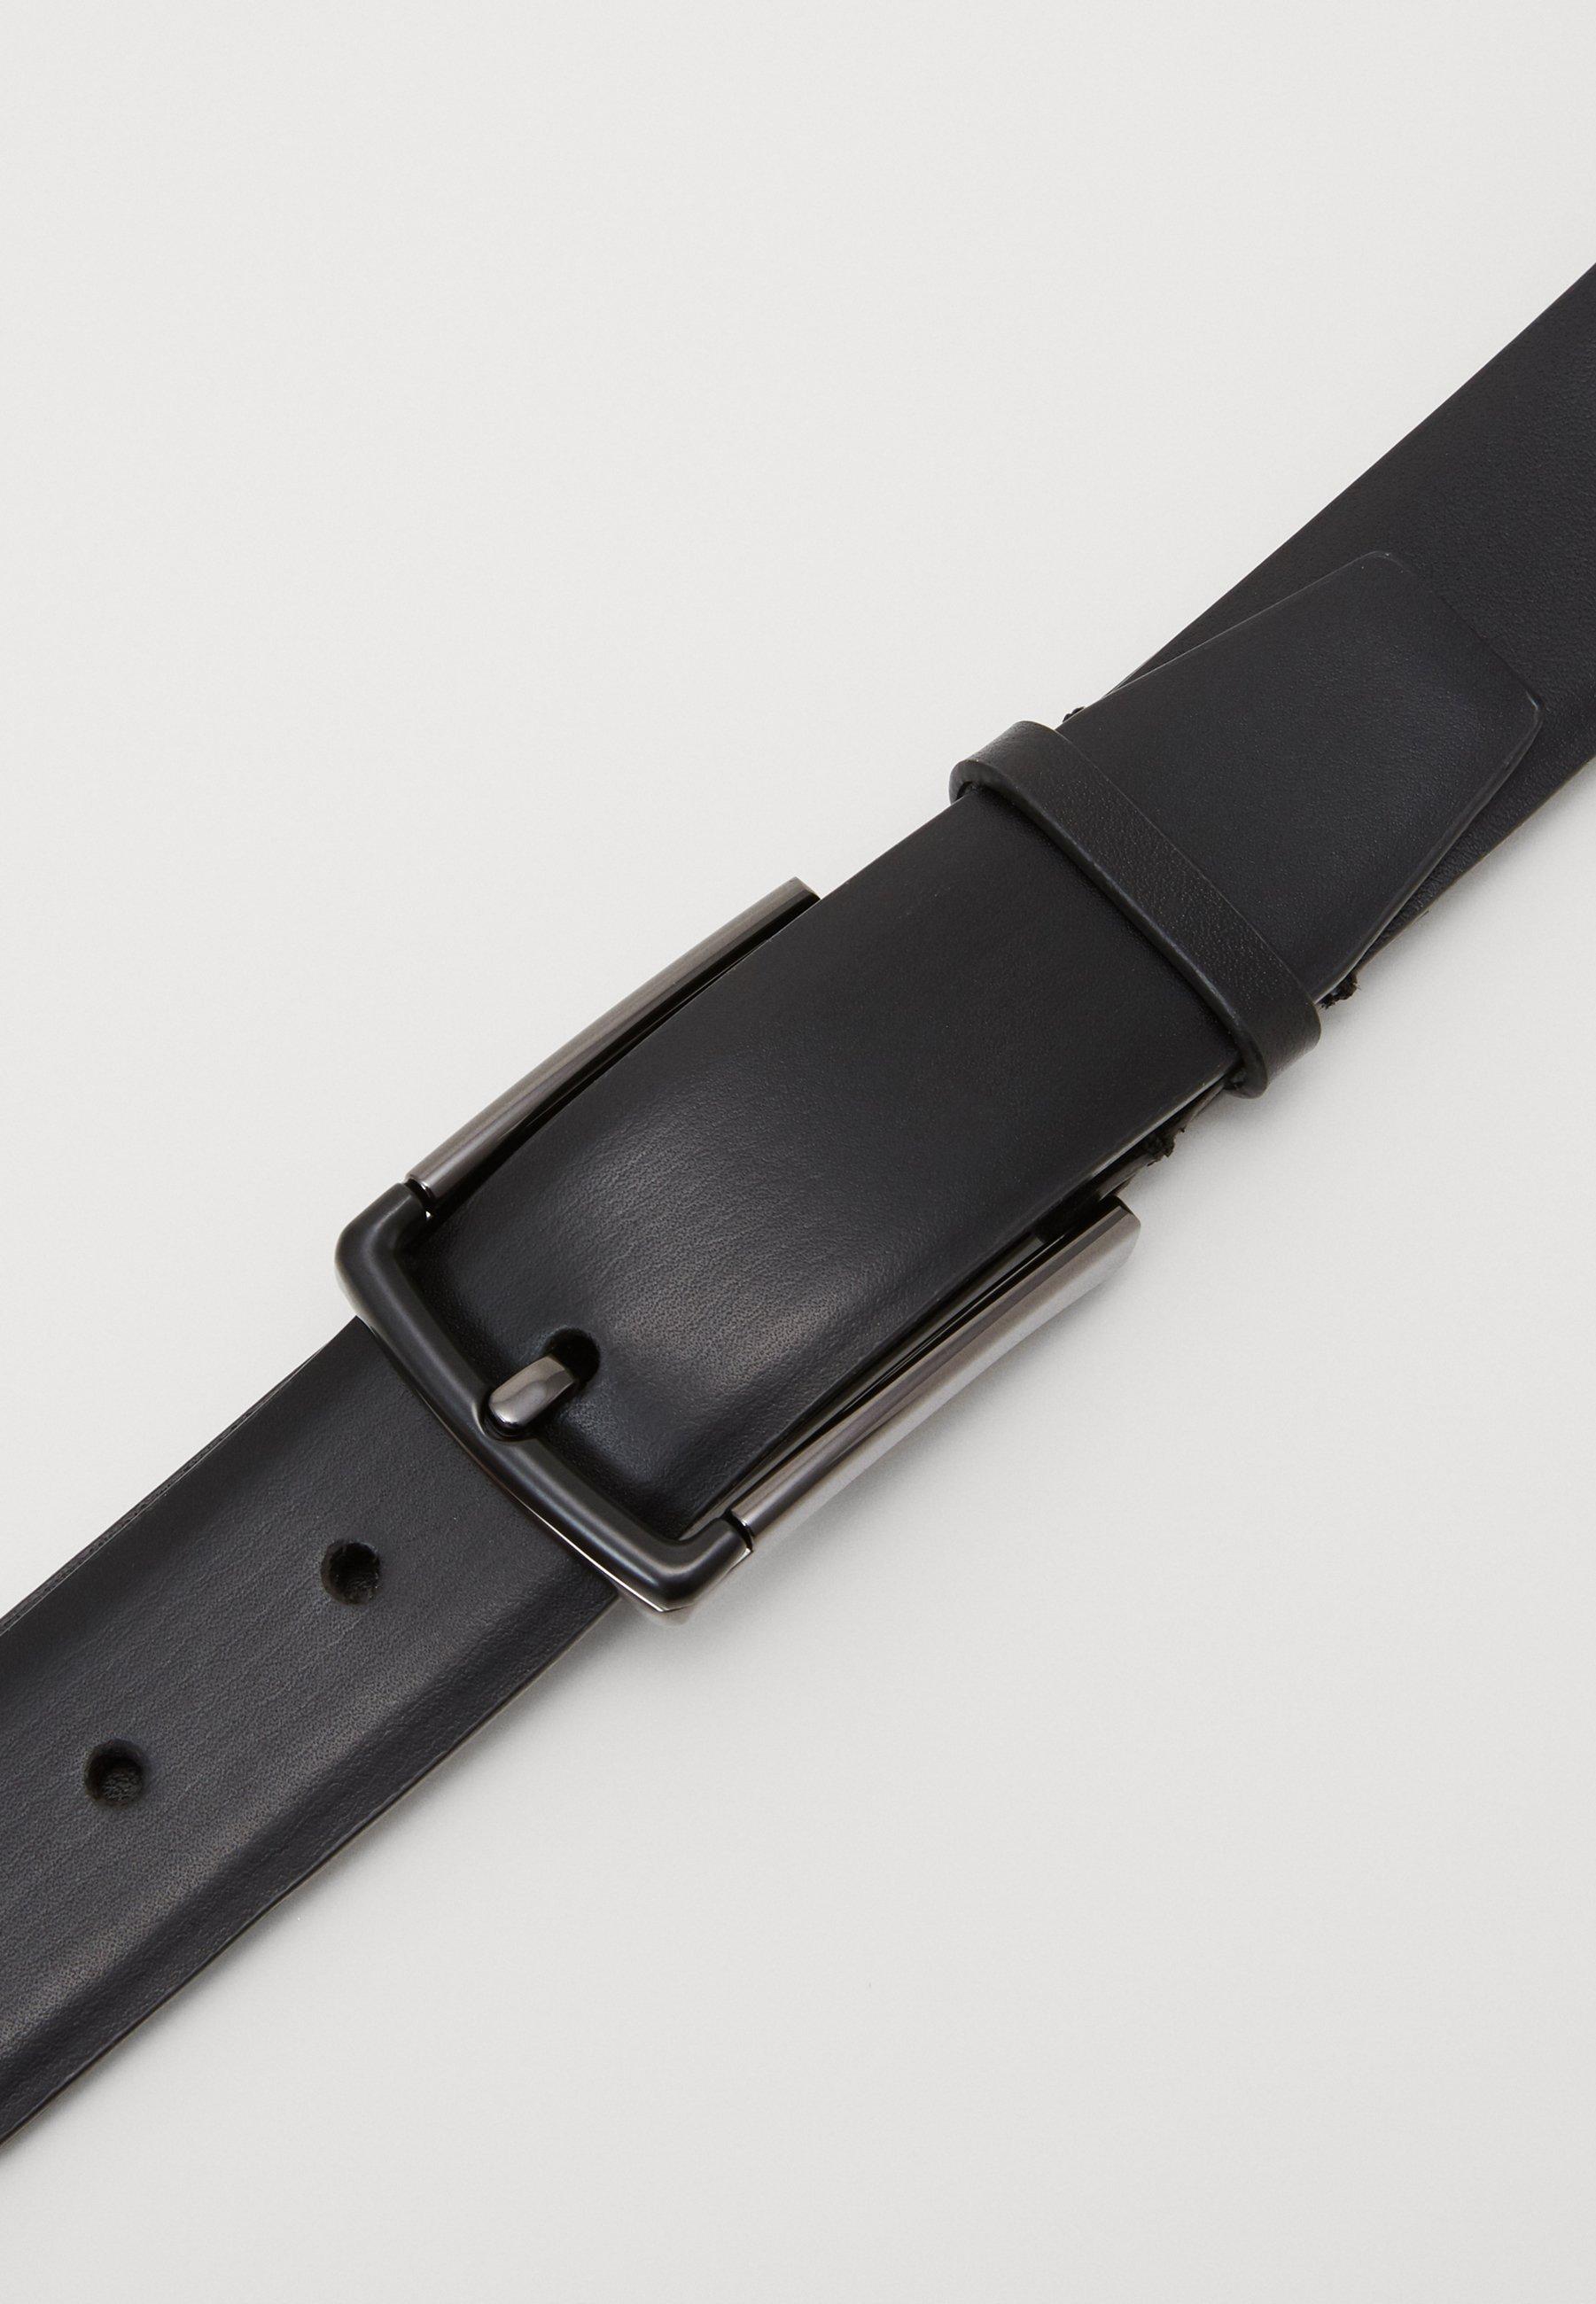 Zign LEATHER - Belte - black/svart pZWHC55Fj3CyRK0